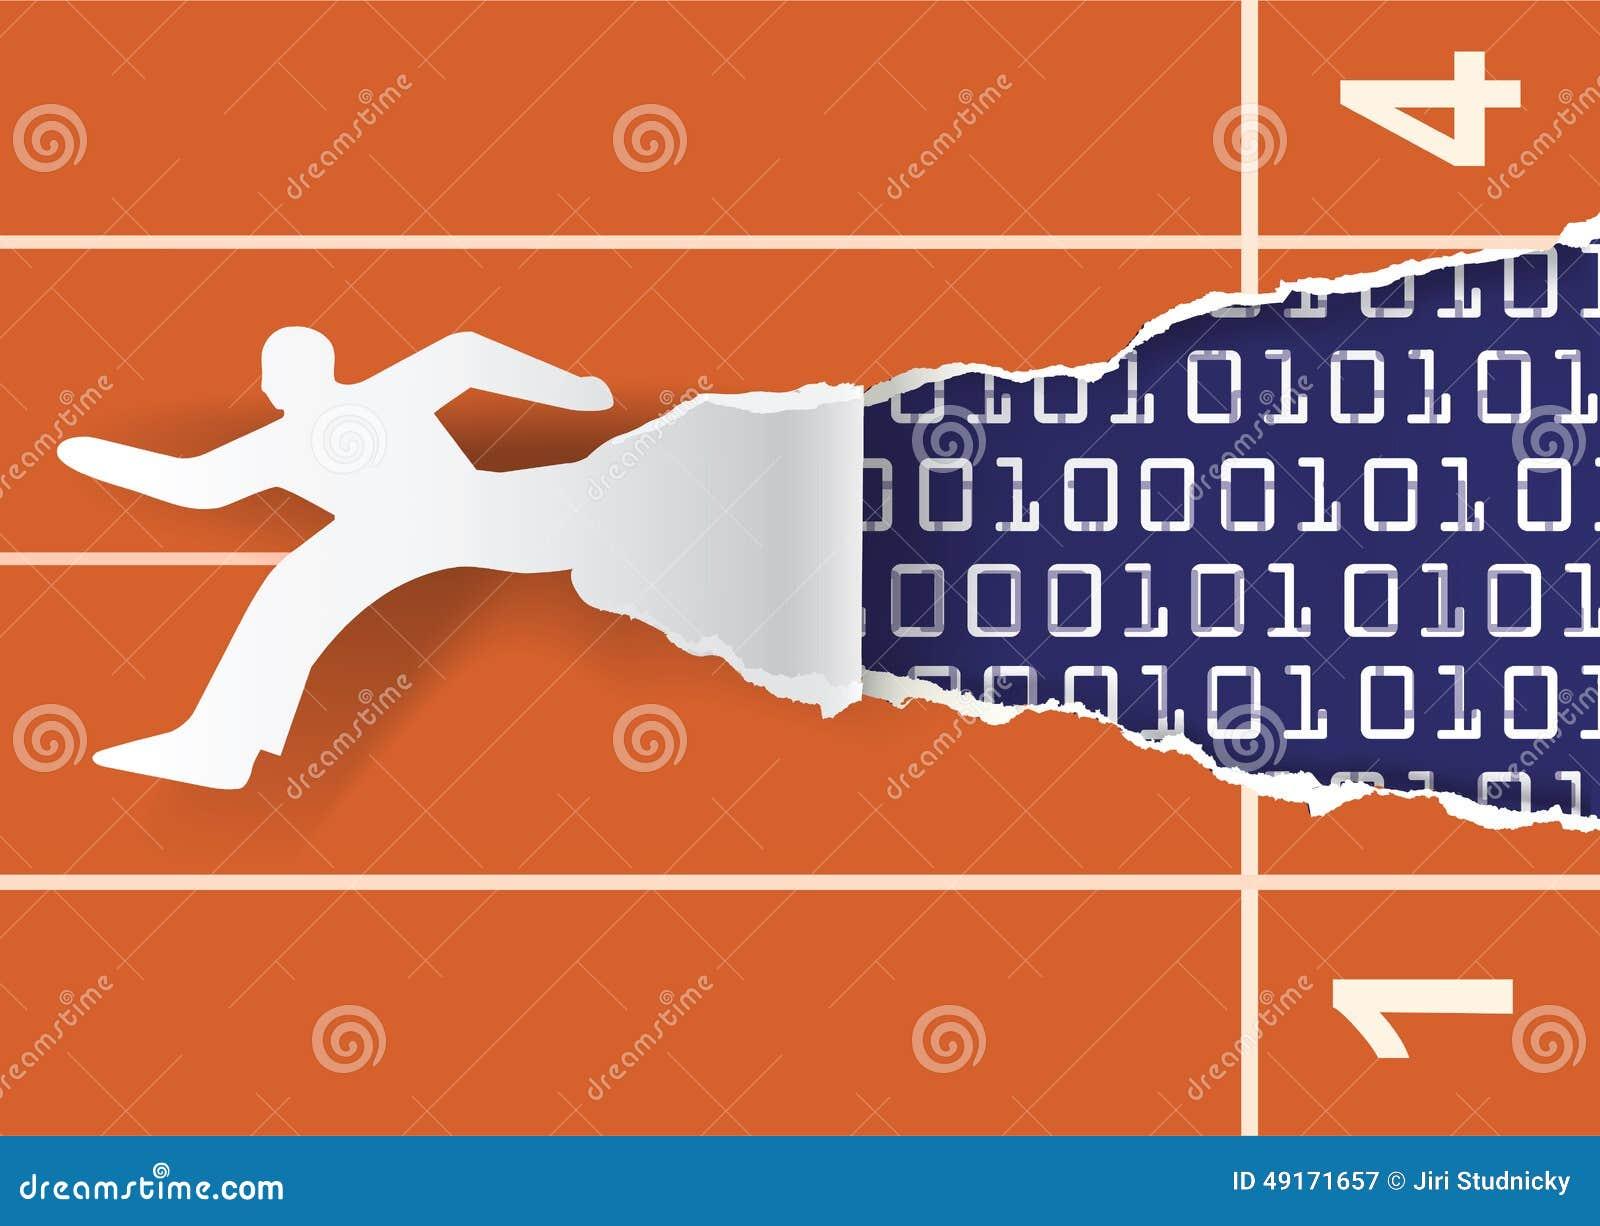 fast internet promotional flyer template stock vector illustration